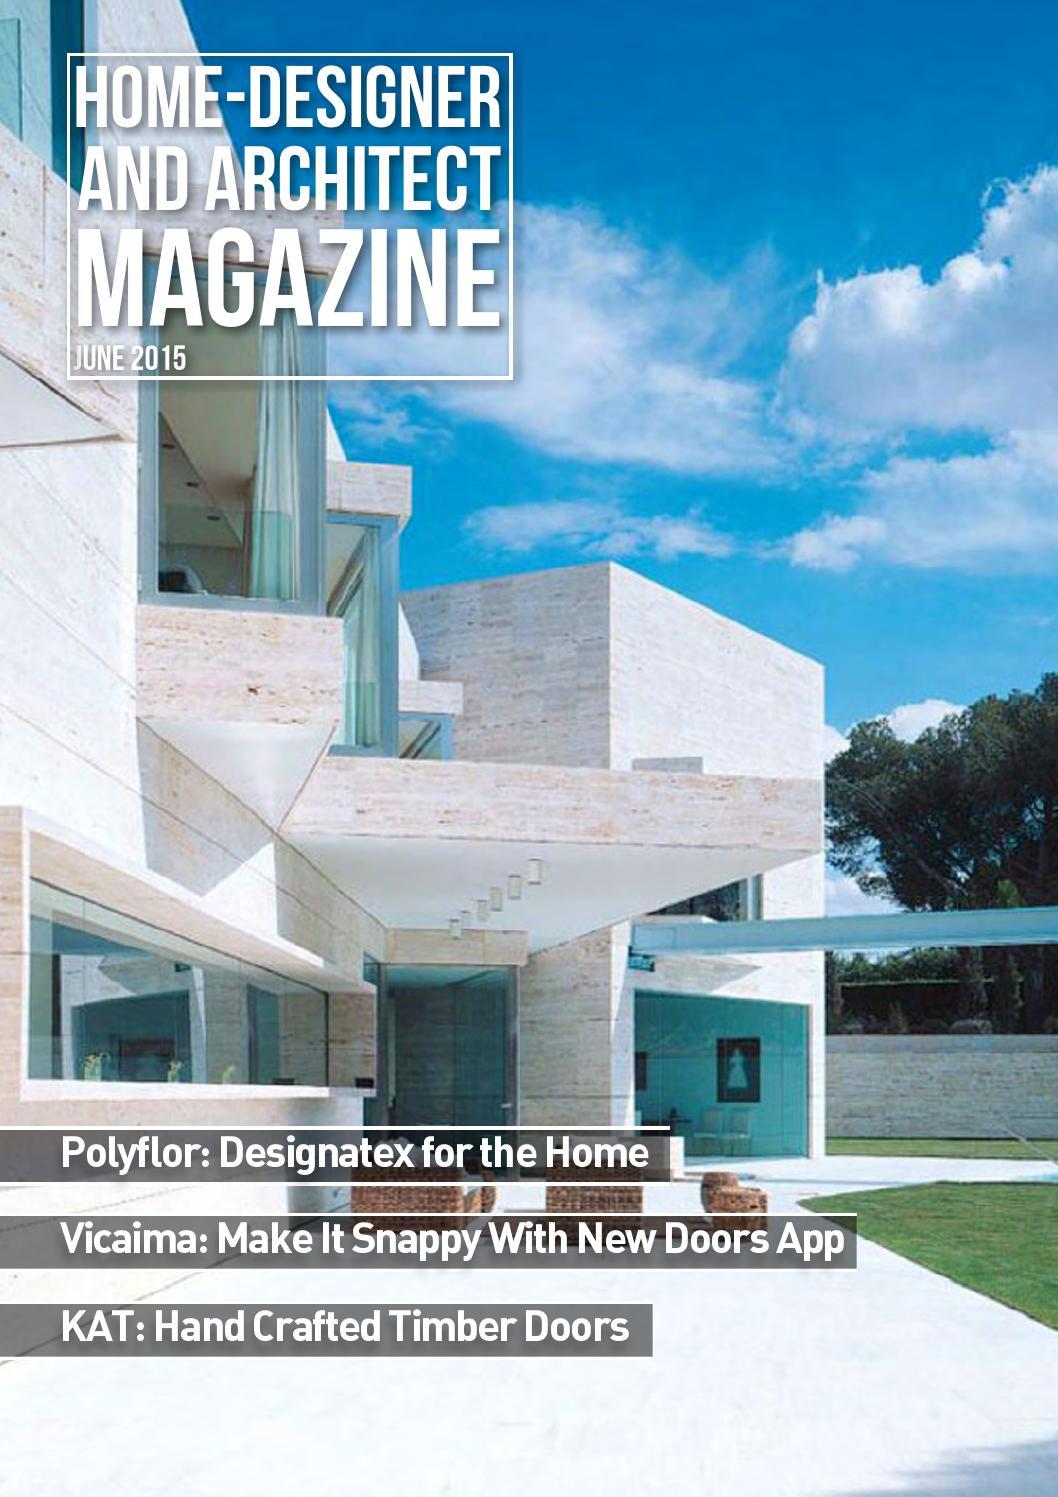 Best Home Designer And Architect Photos - Interior Design Ideas ...